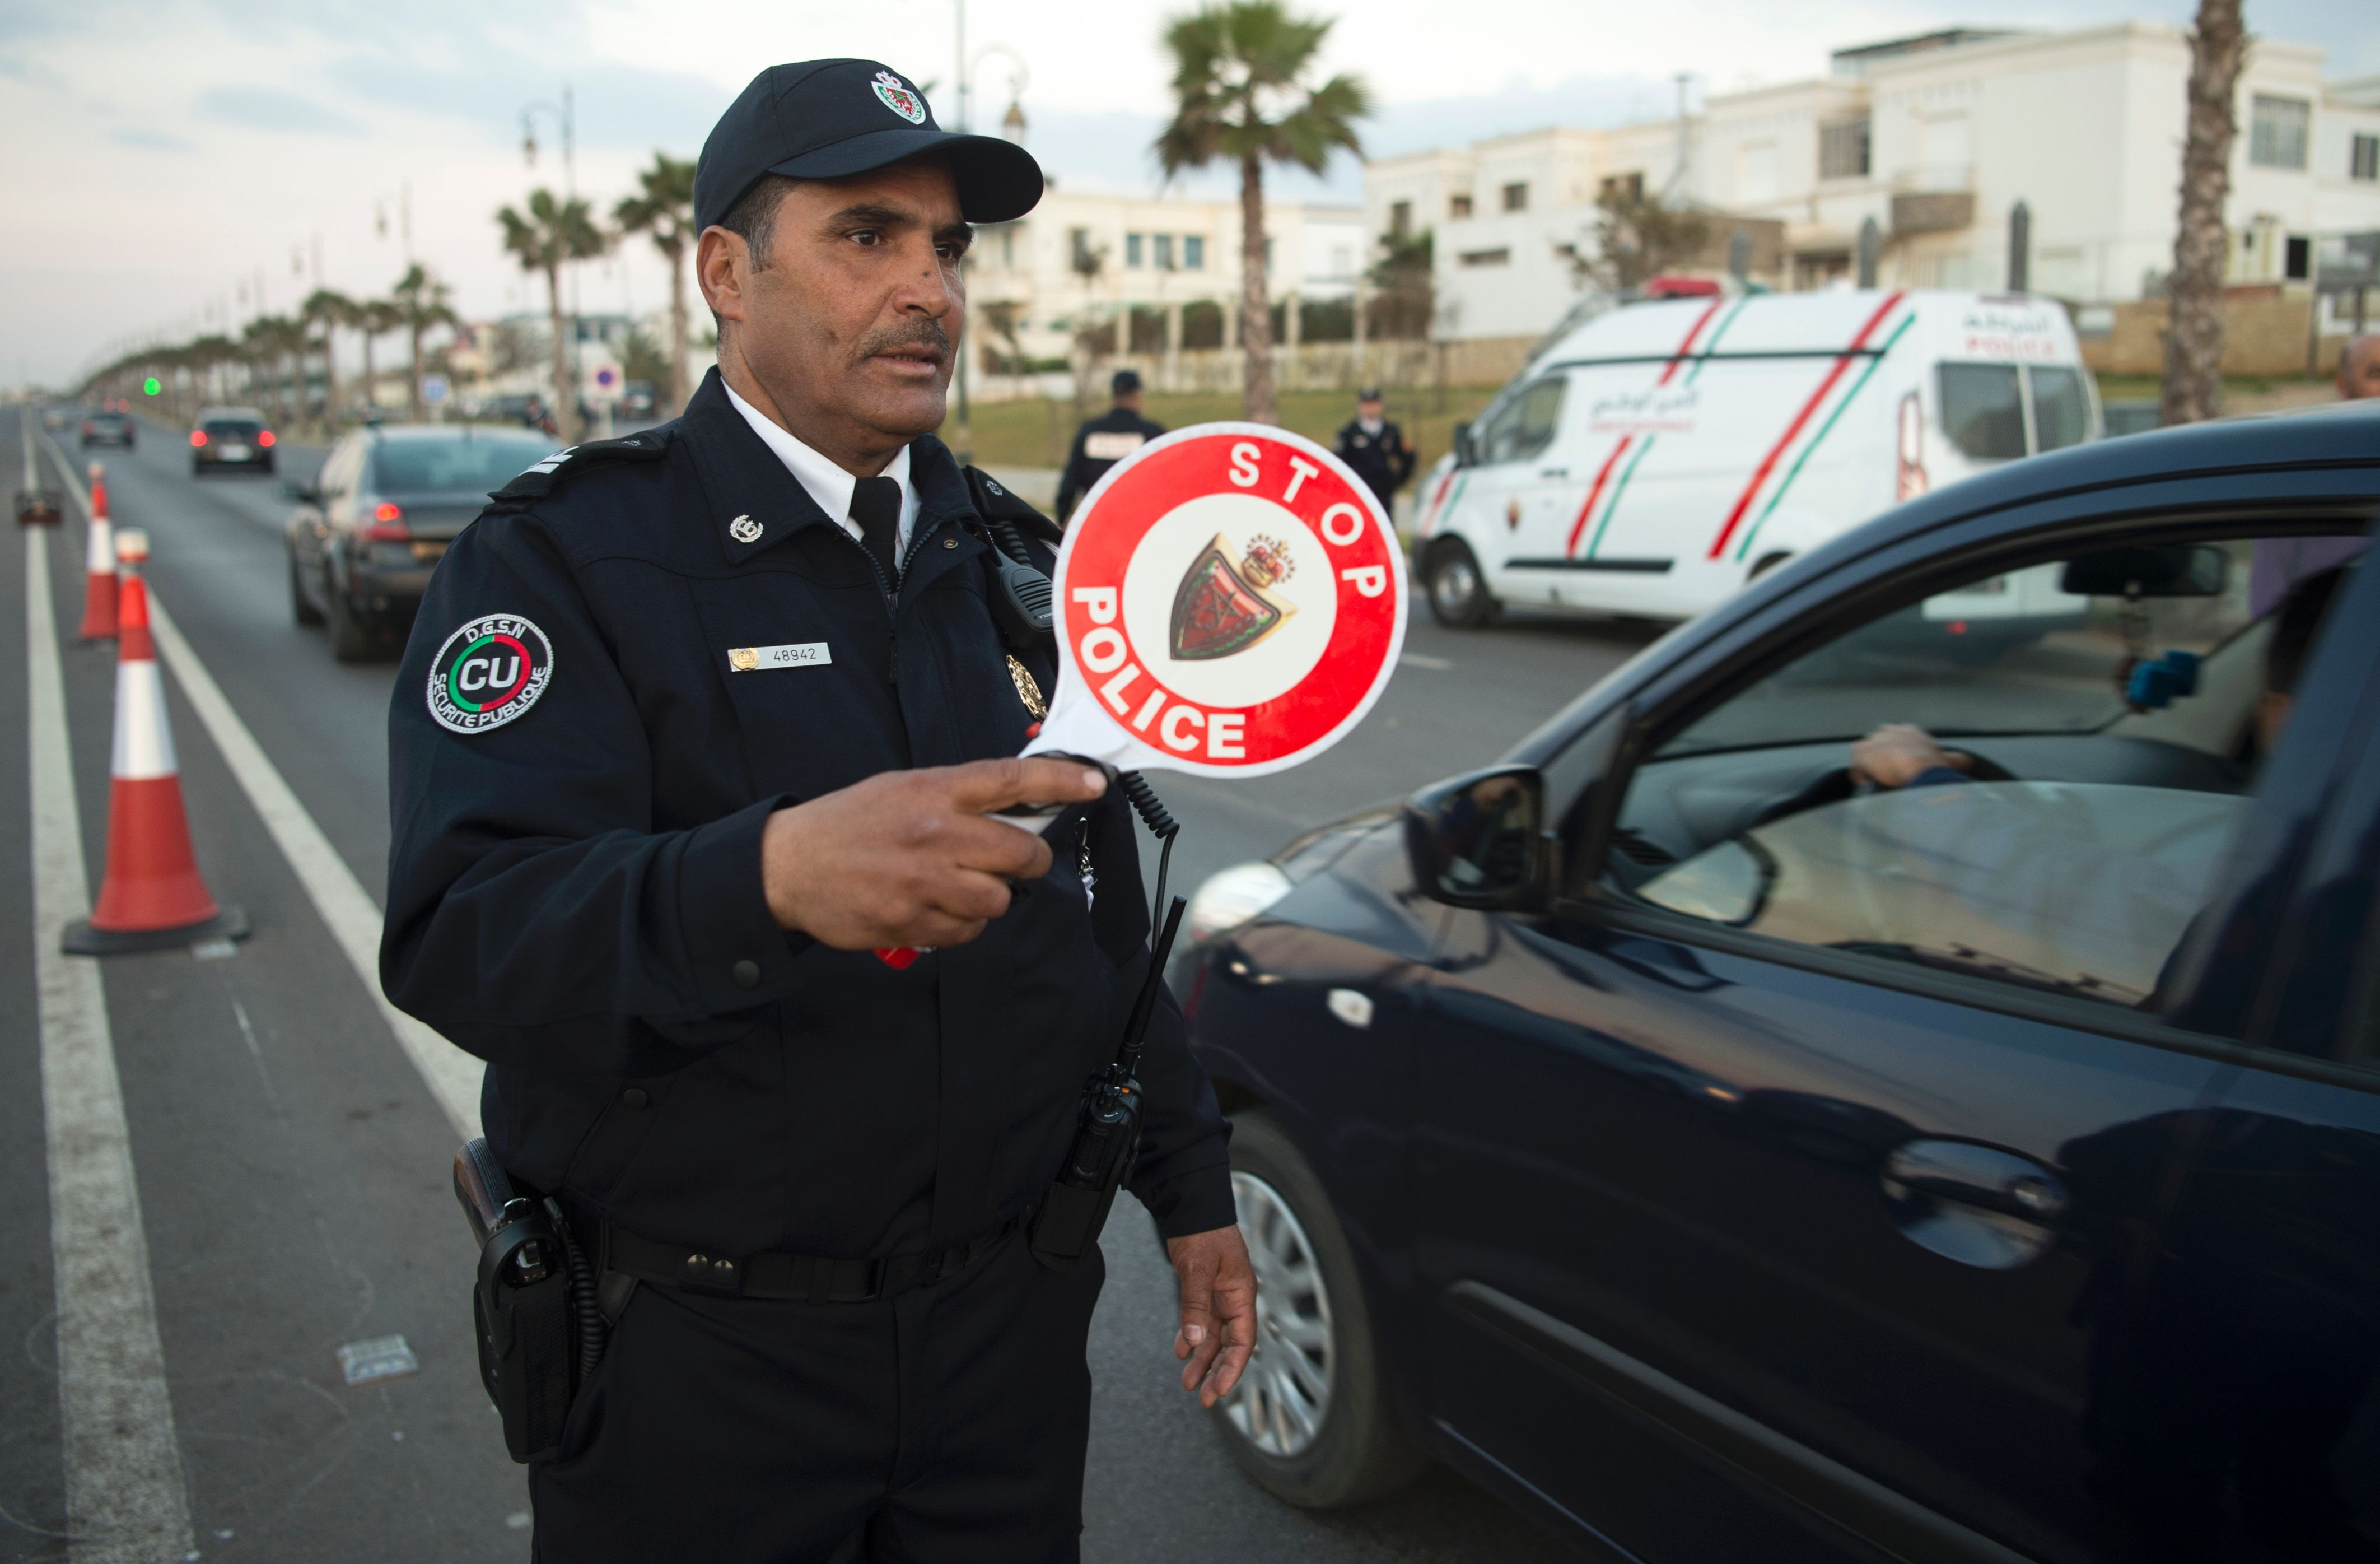 tout sur la police - Page 10 840993-شرطة-المغرب